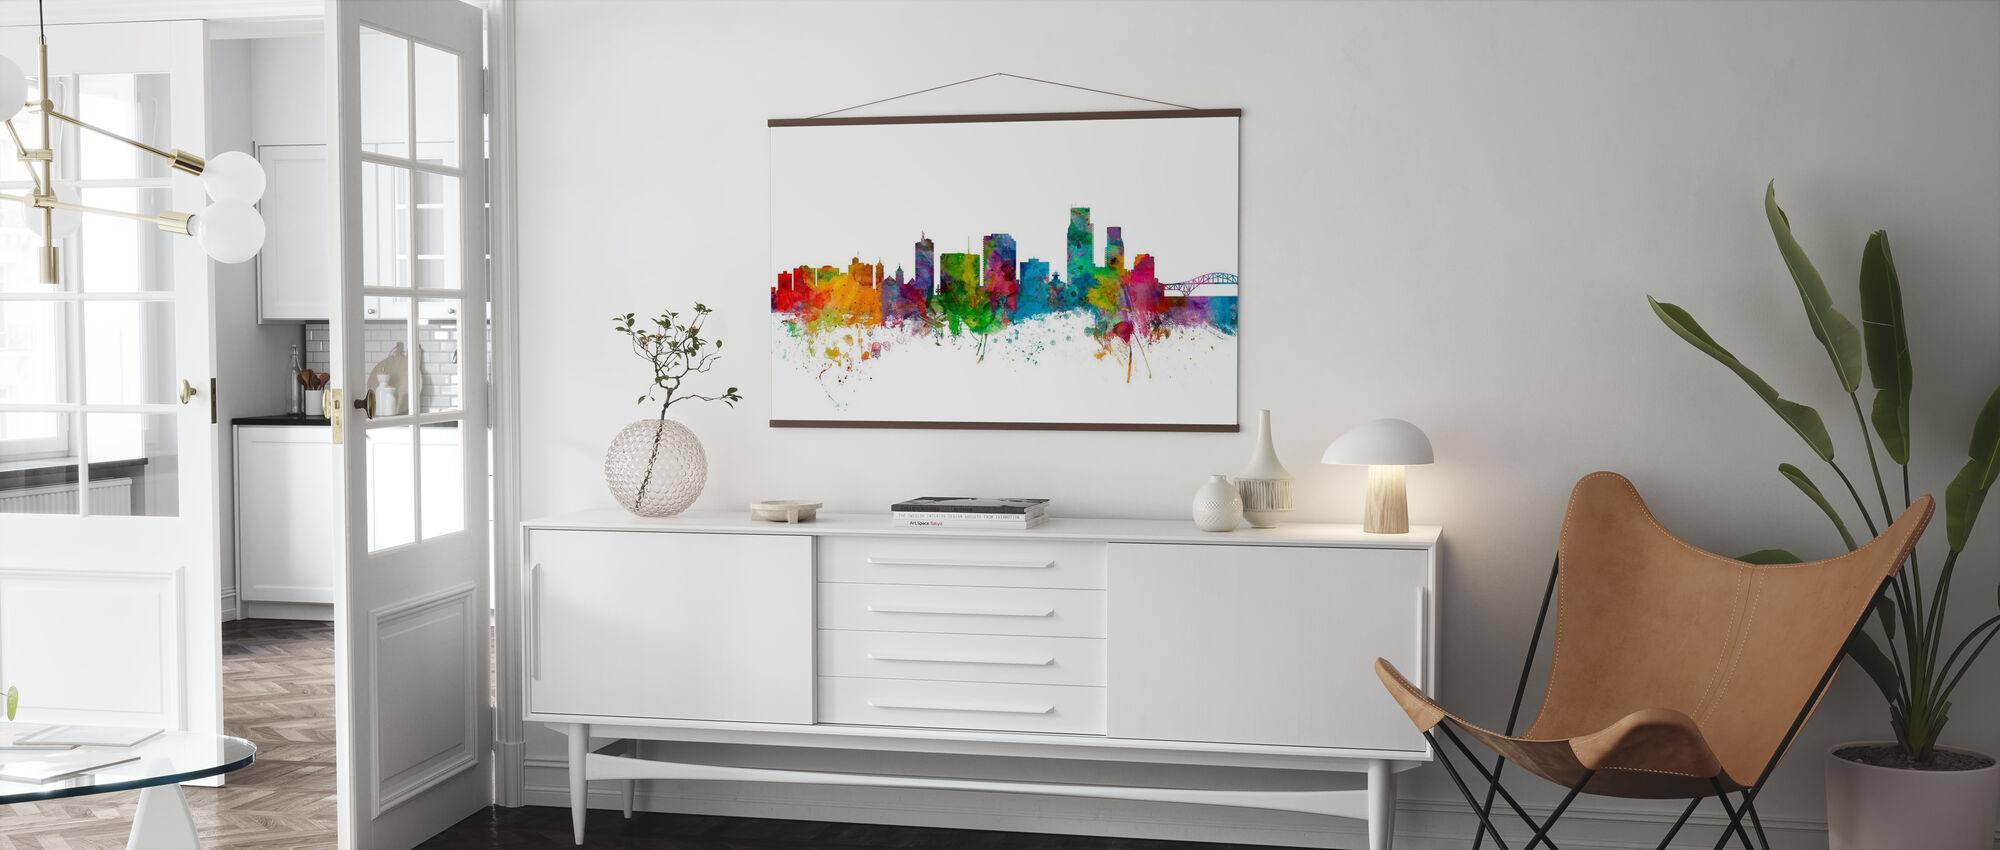 Corpus Christie Texas Skyline - Plakat - Stue